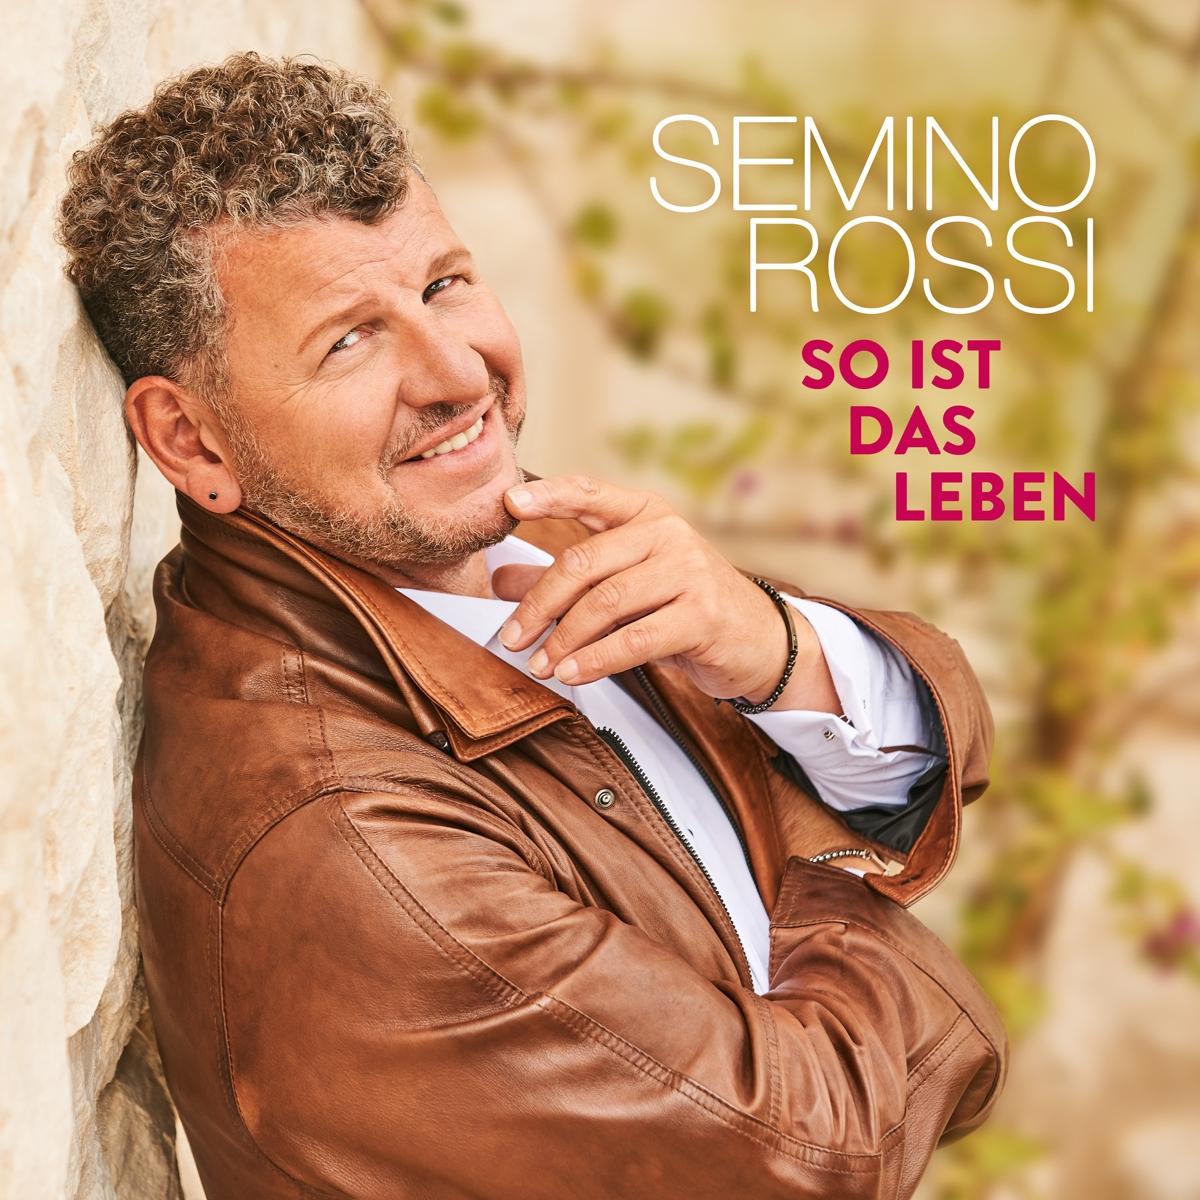 So Ist Das Leben - Semino Rossi - Musik - ARIOLA - 0190758071725 - 5/7-2019